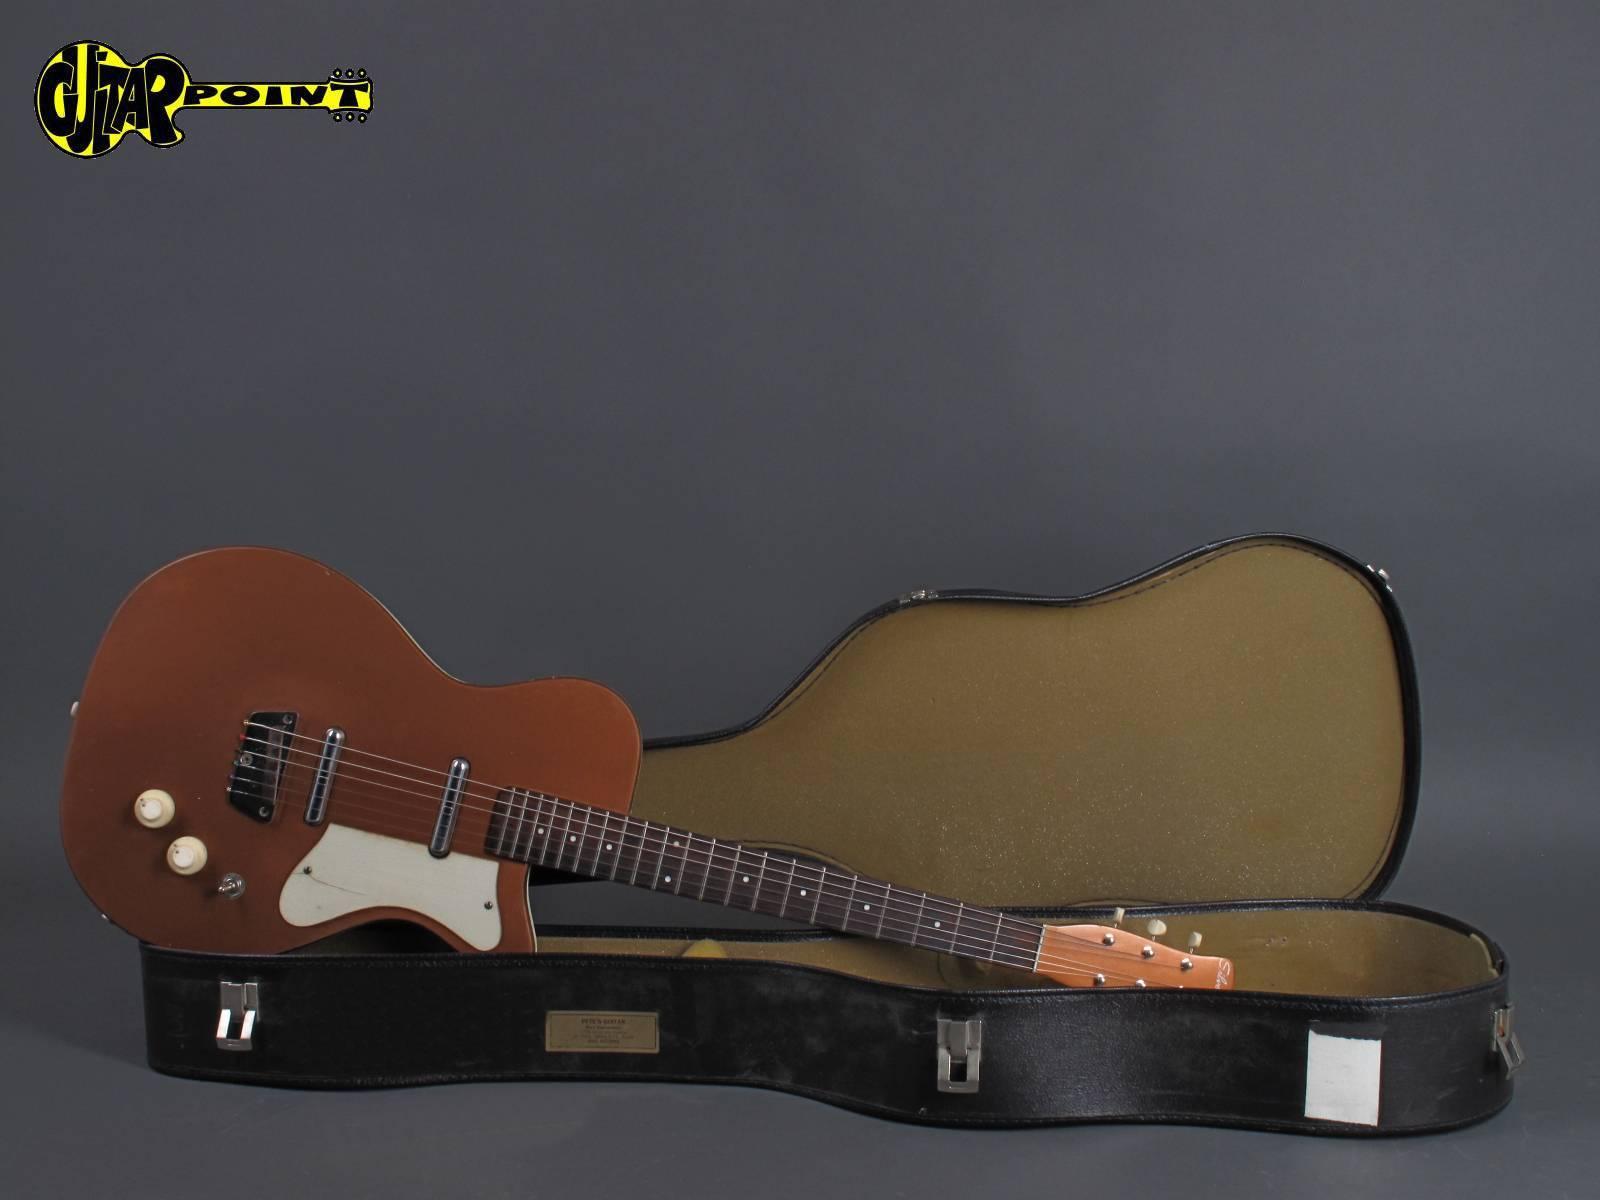 U 2 1959 1959 Silvertone U2 mod...